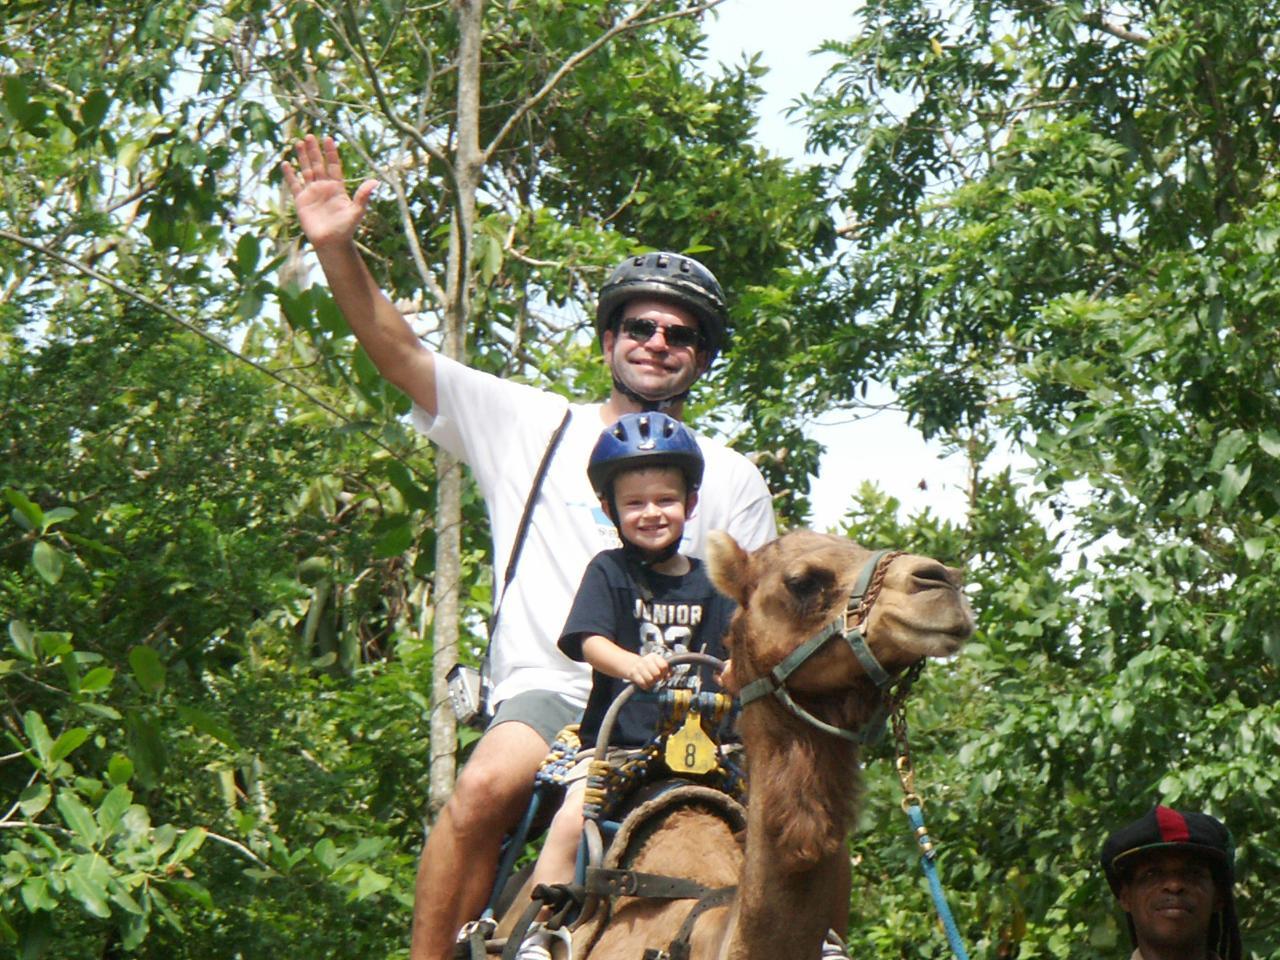 Camel Outback Adventure Tour from Ocho Rios